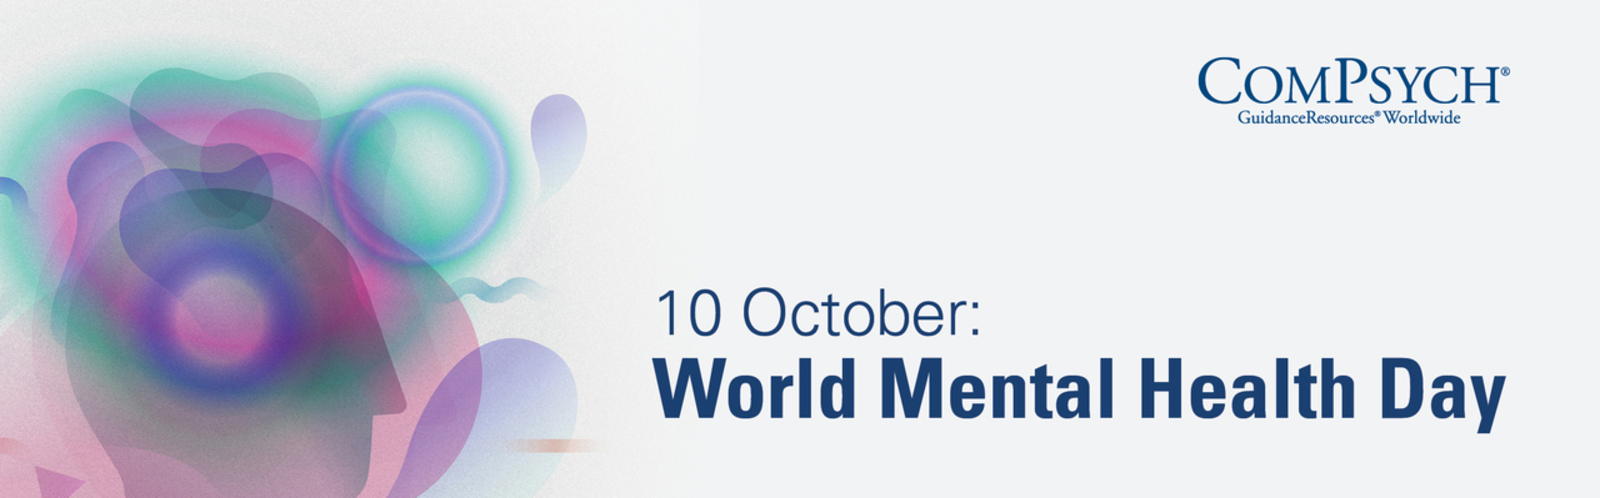 10 October: World Mental Health Day